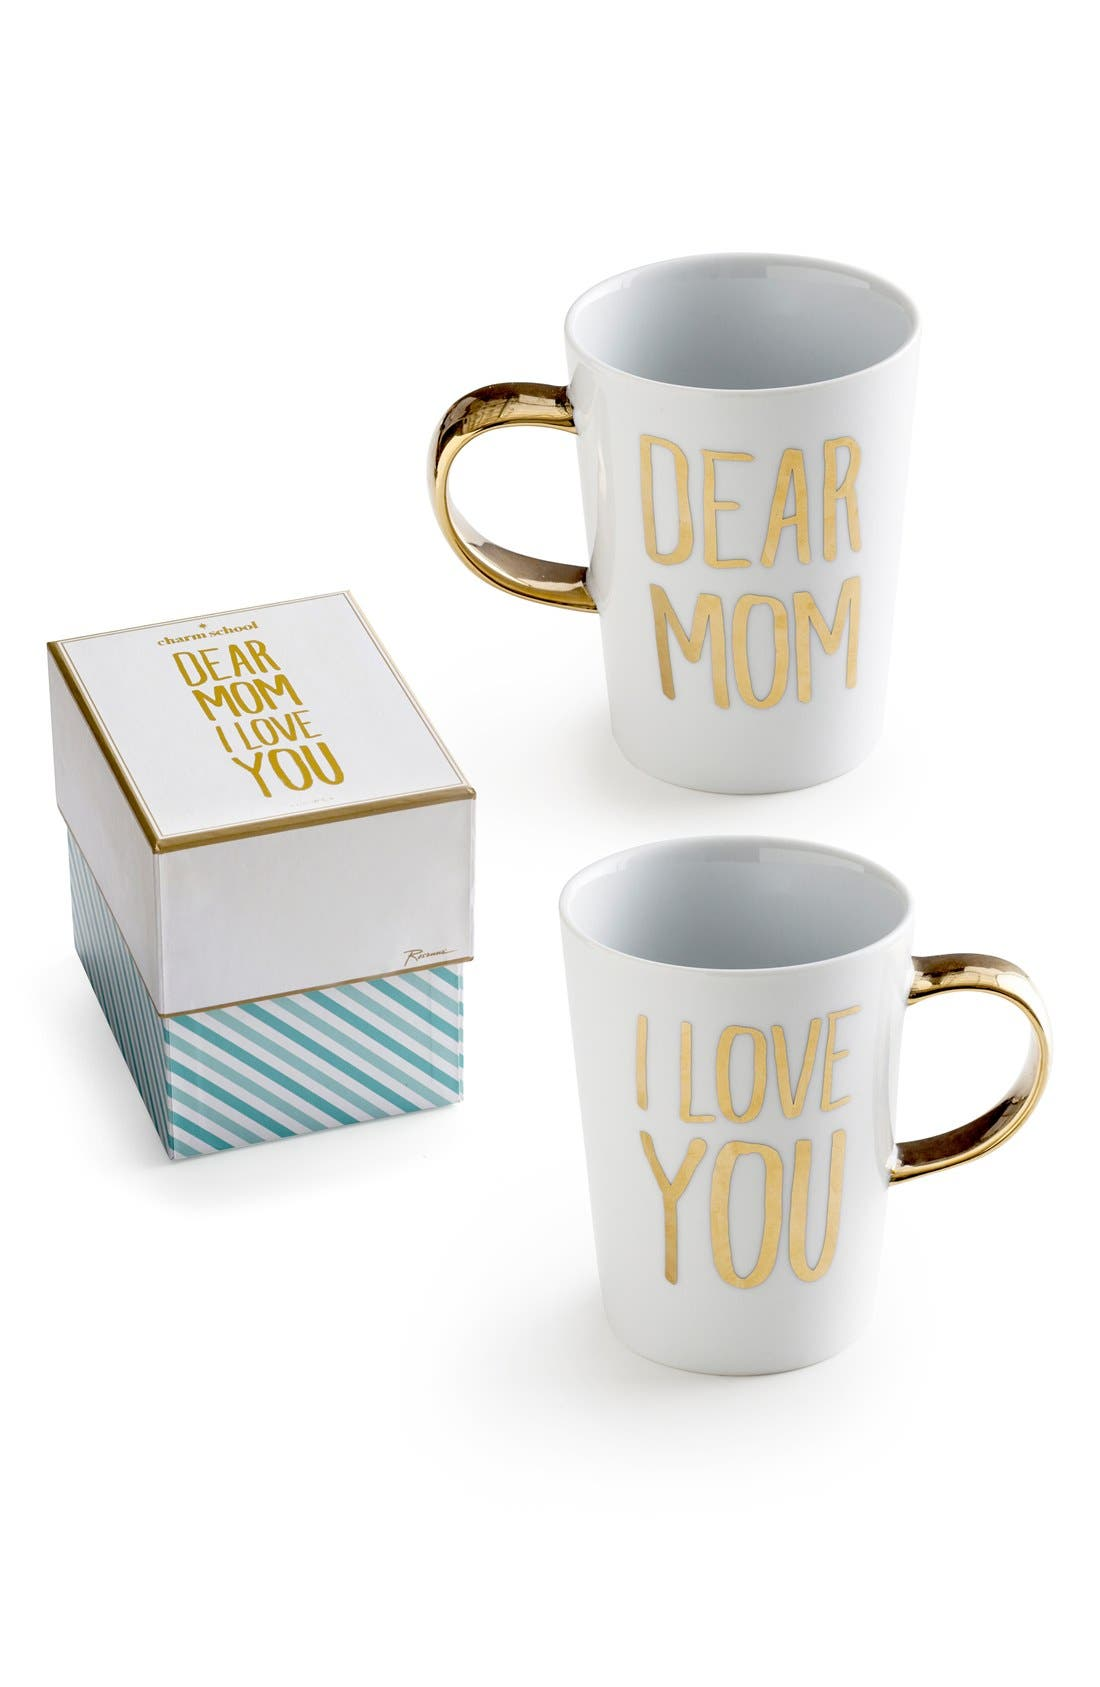 Main Image - Rosanna 'Dear Mom I Love You' Porcelain Coffee Mug